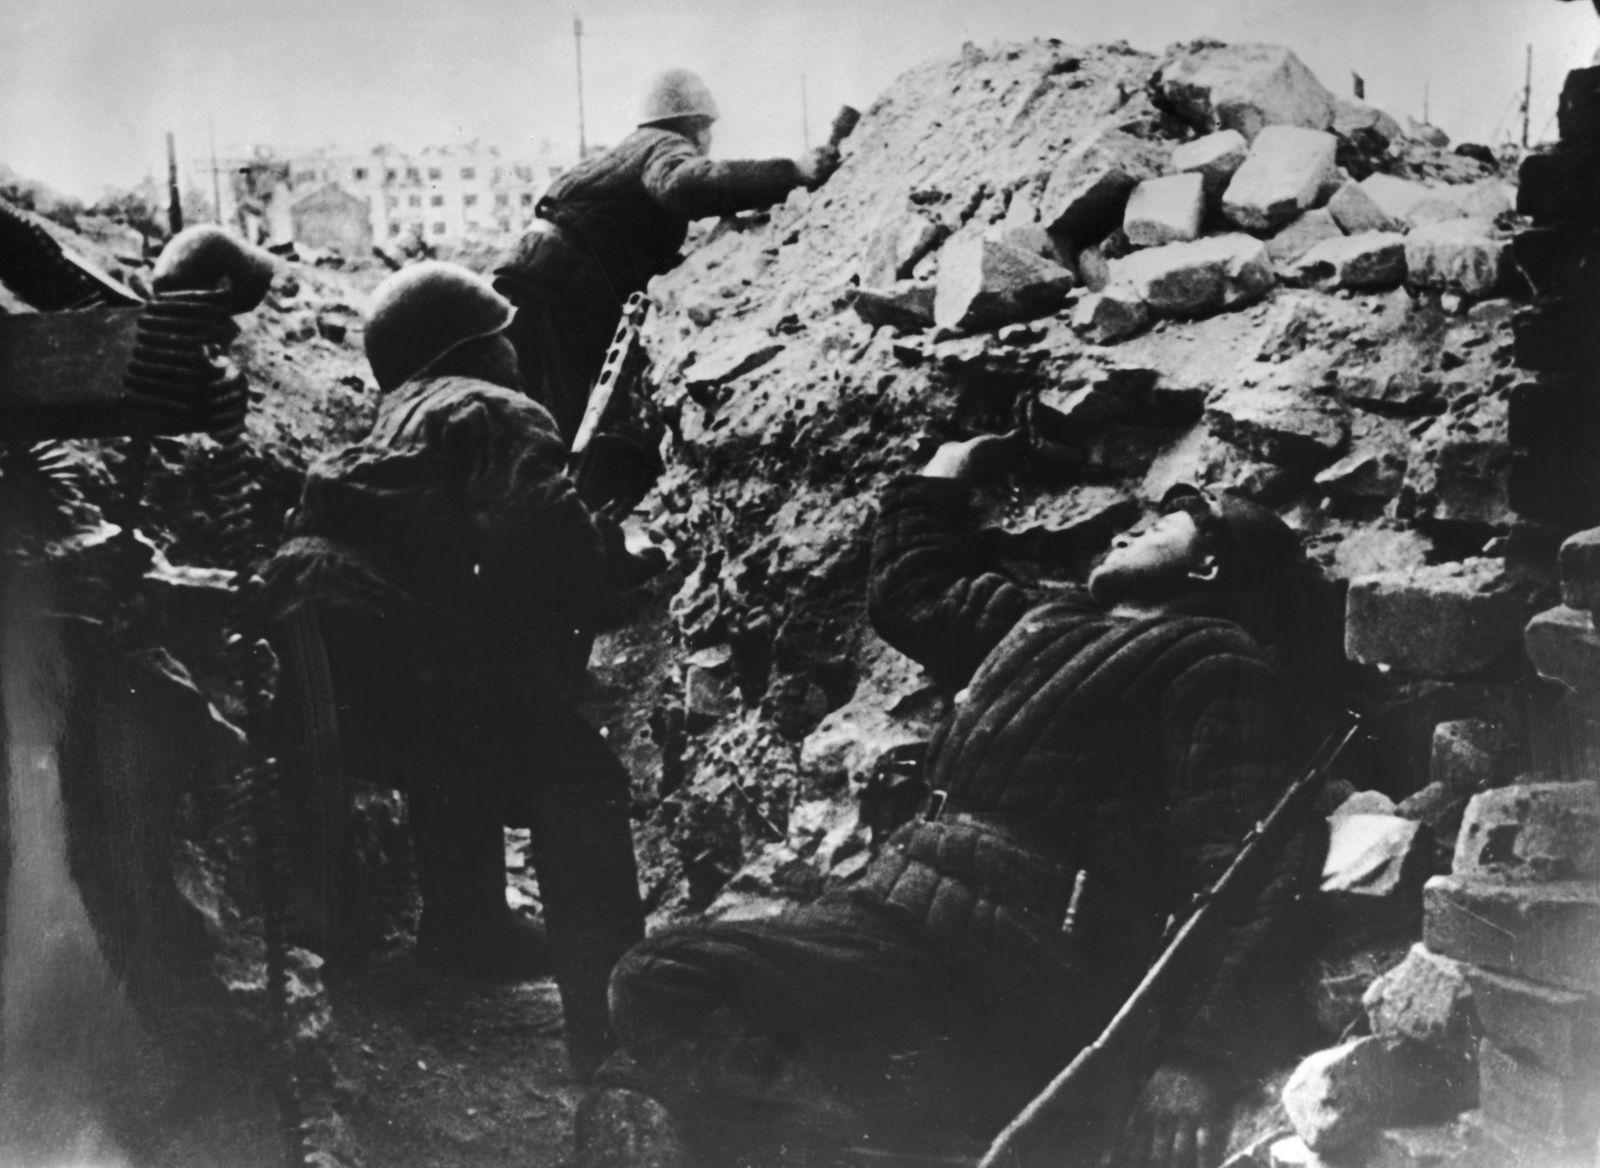 Kriegszitterer - Battle Of Stalingrad